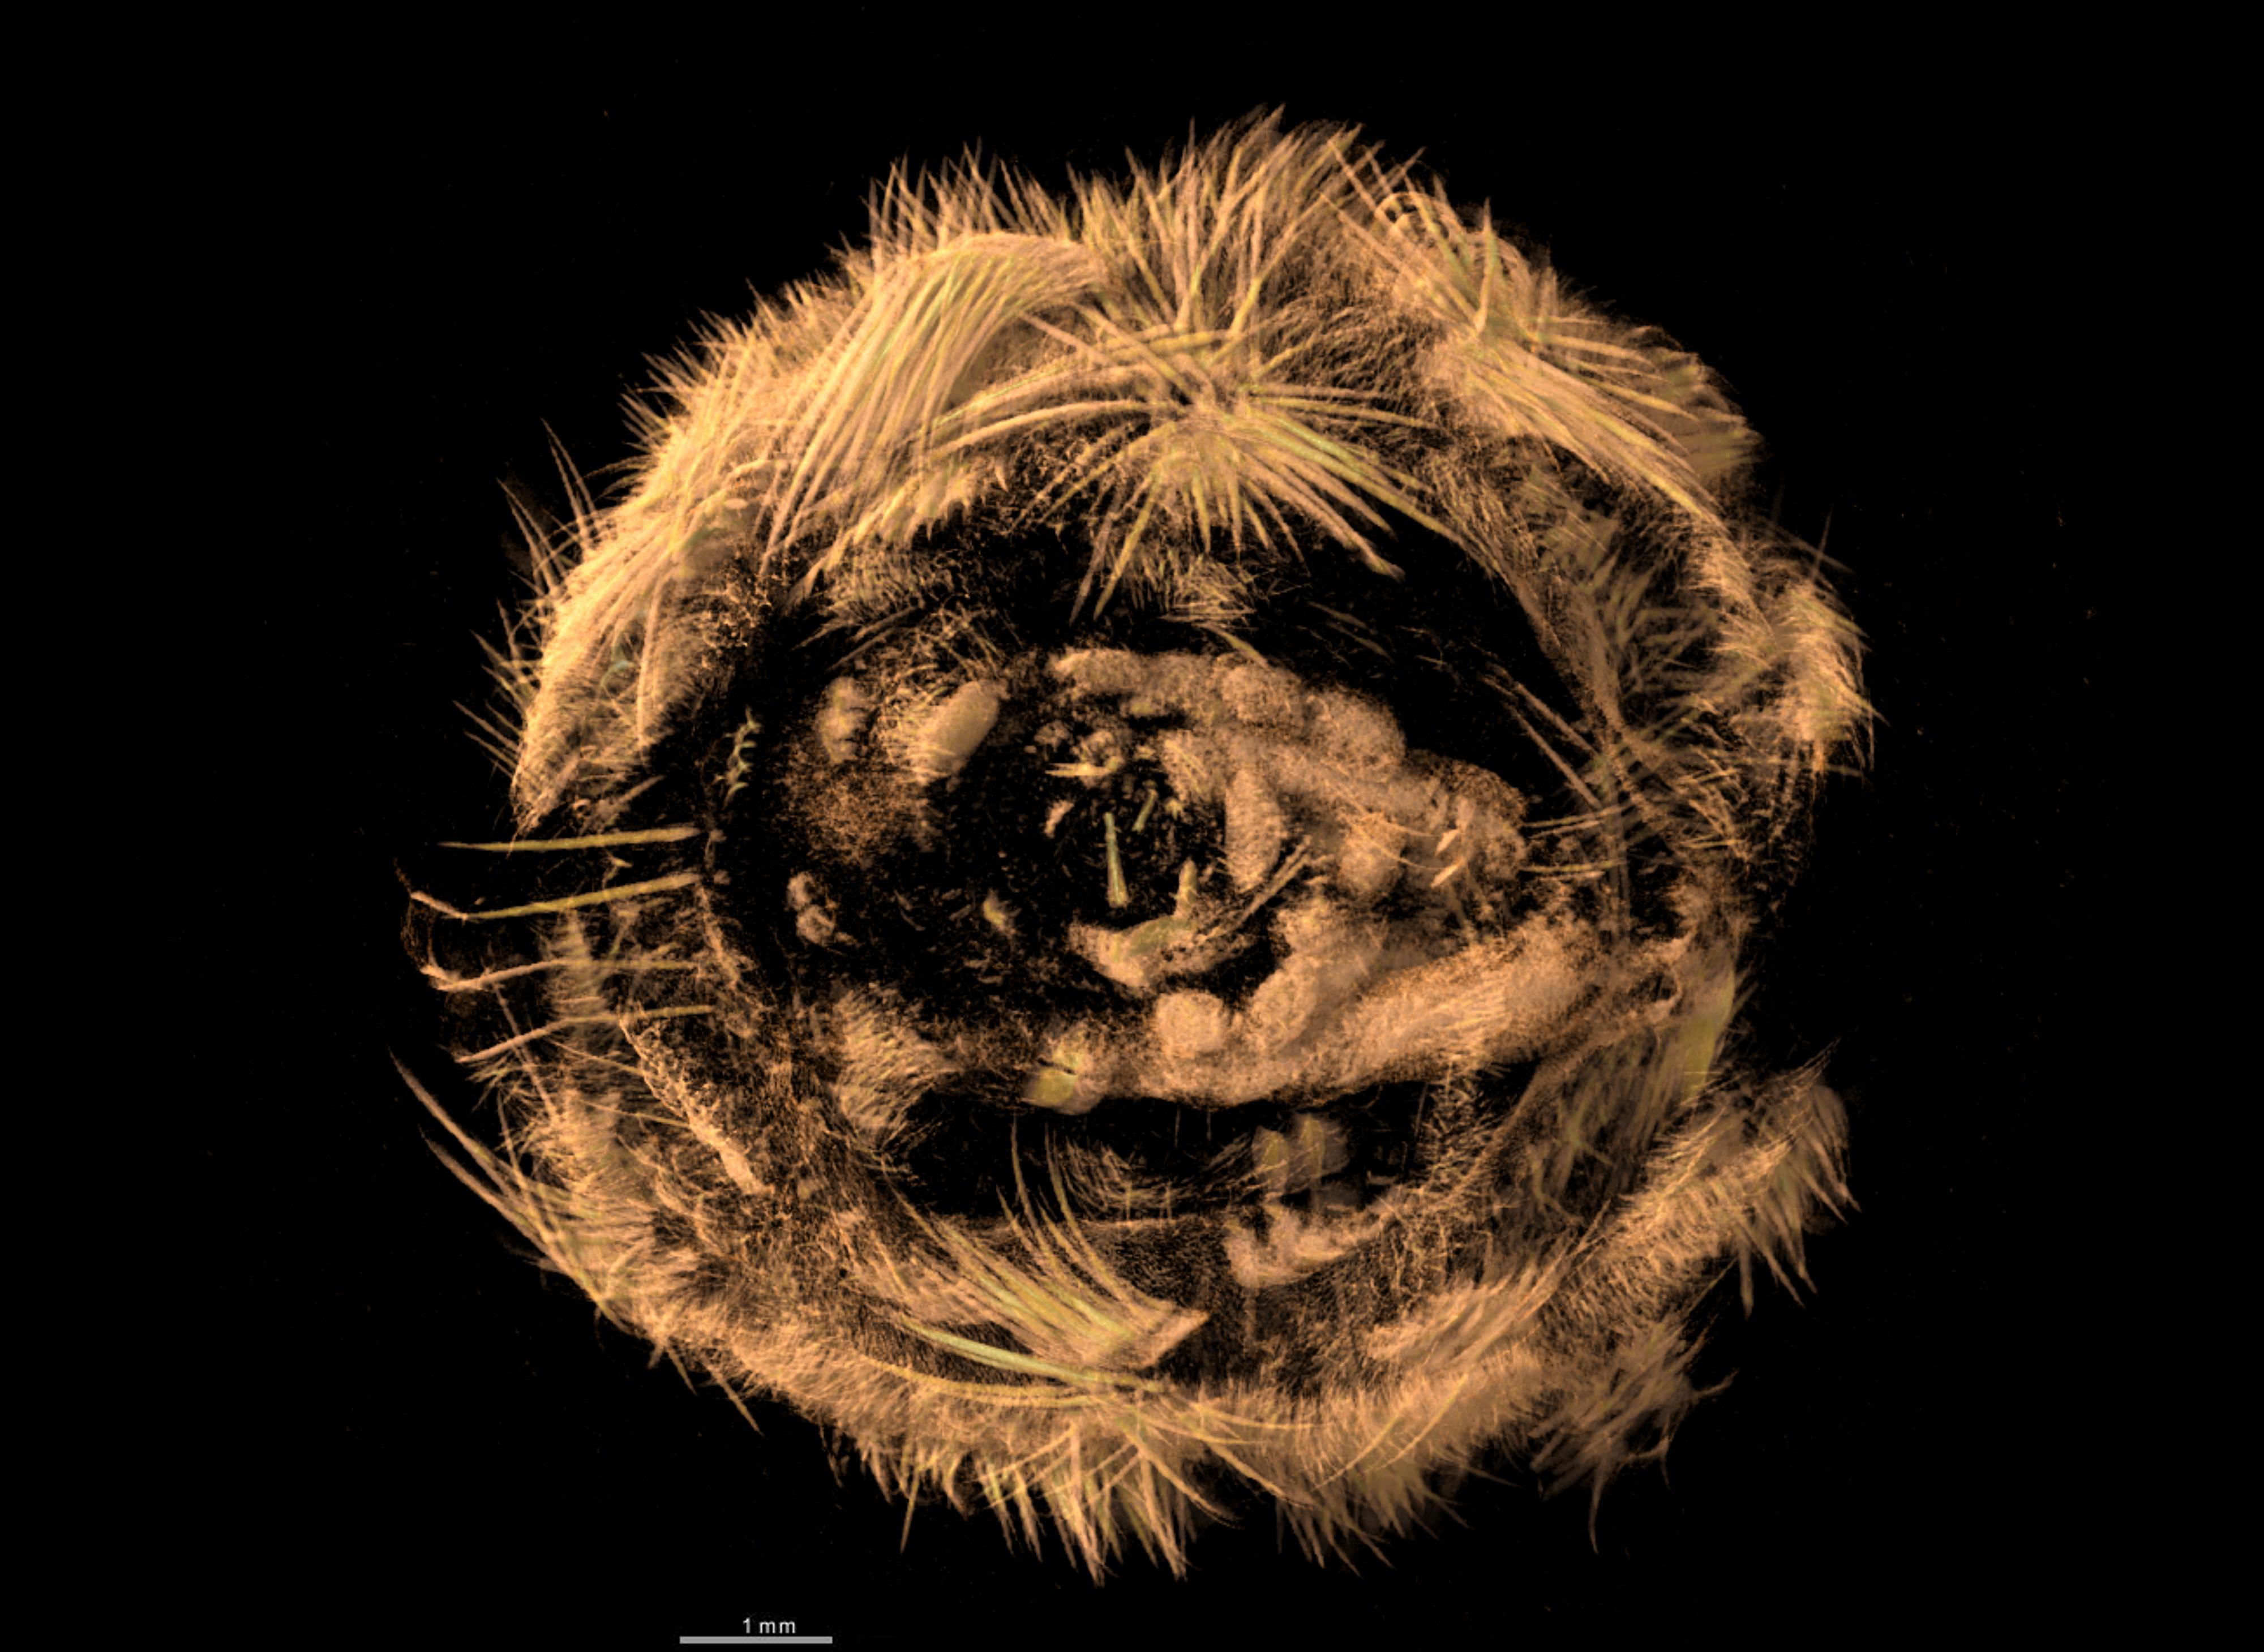 BE-RBINS-INV-TYPES-MT-3805-Acanthochites-leopoldi-DORSAL.jpg